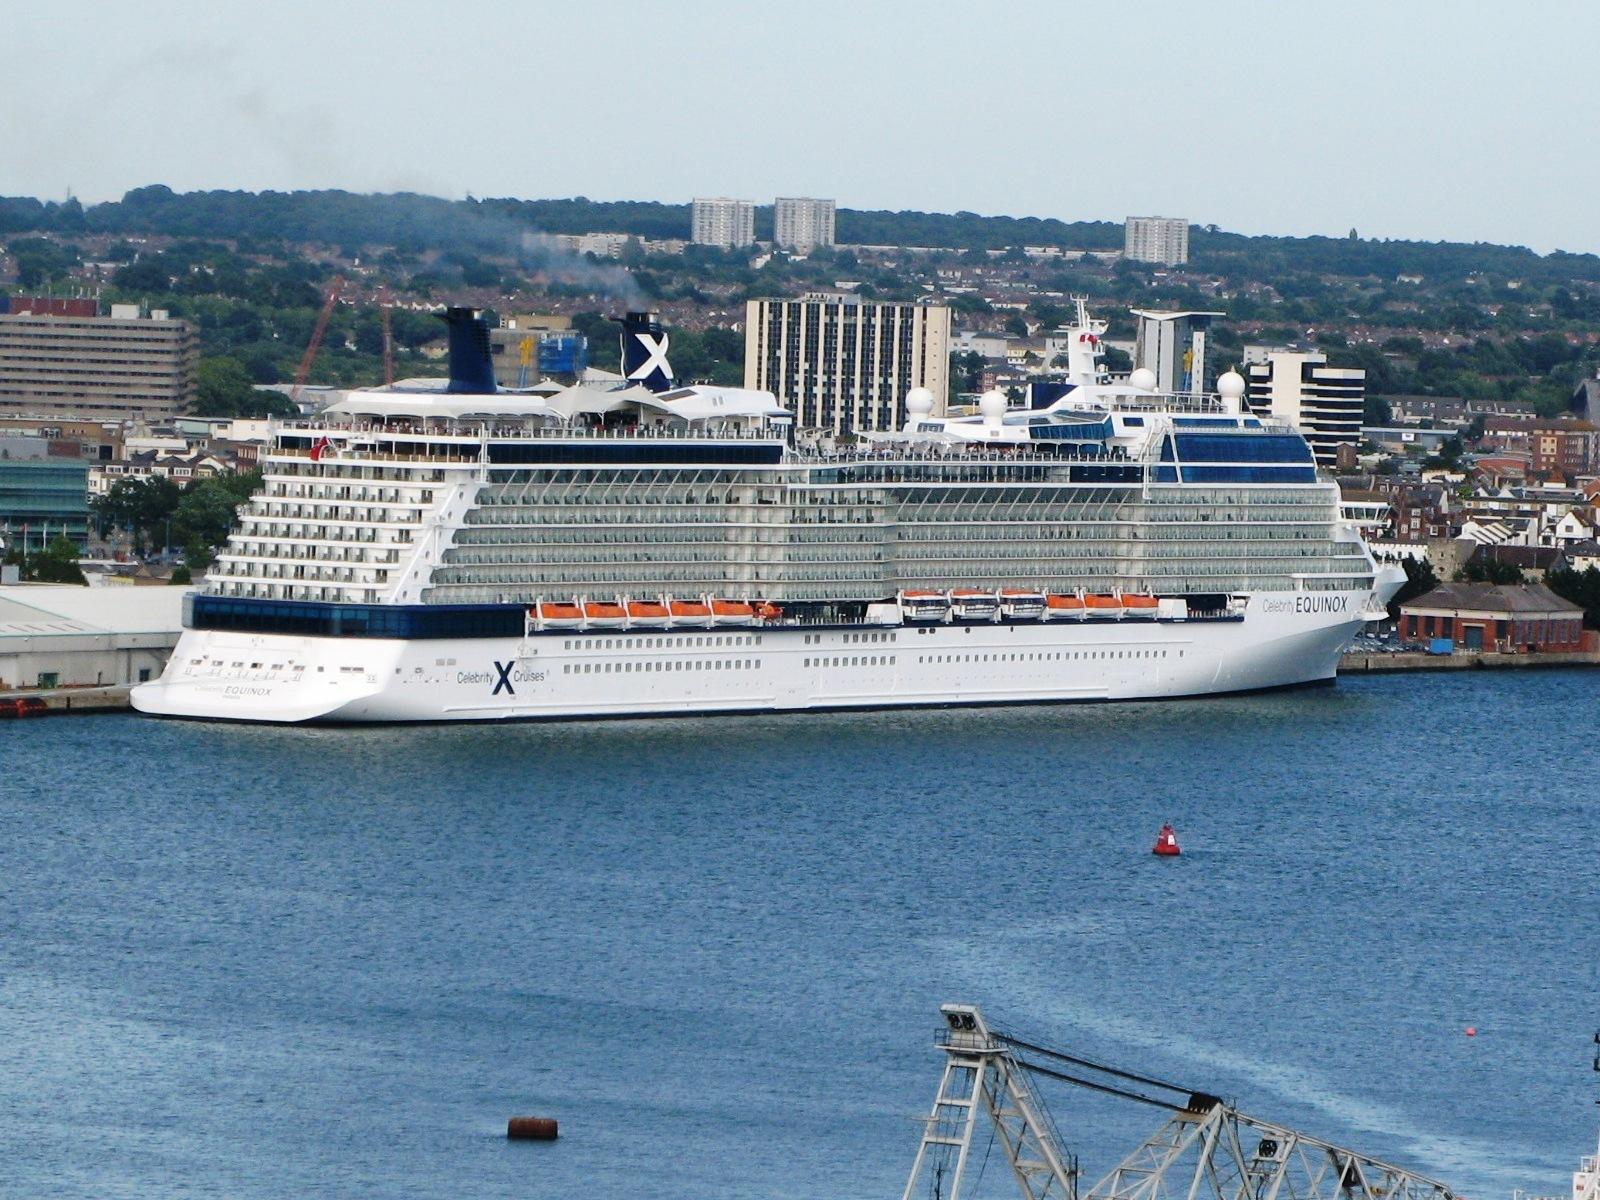 FileCruise Ship Celebrity Equinox 2009JPG